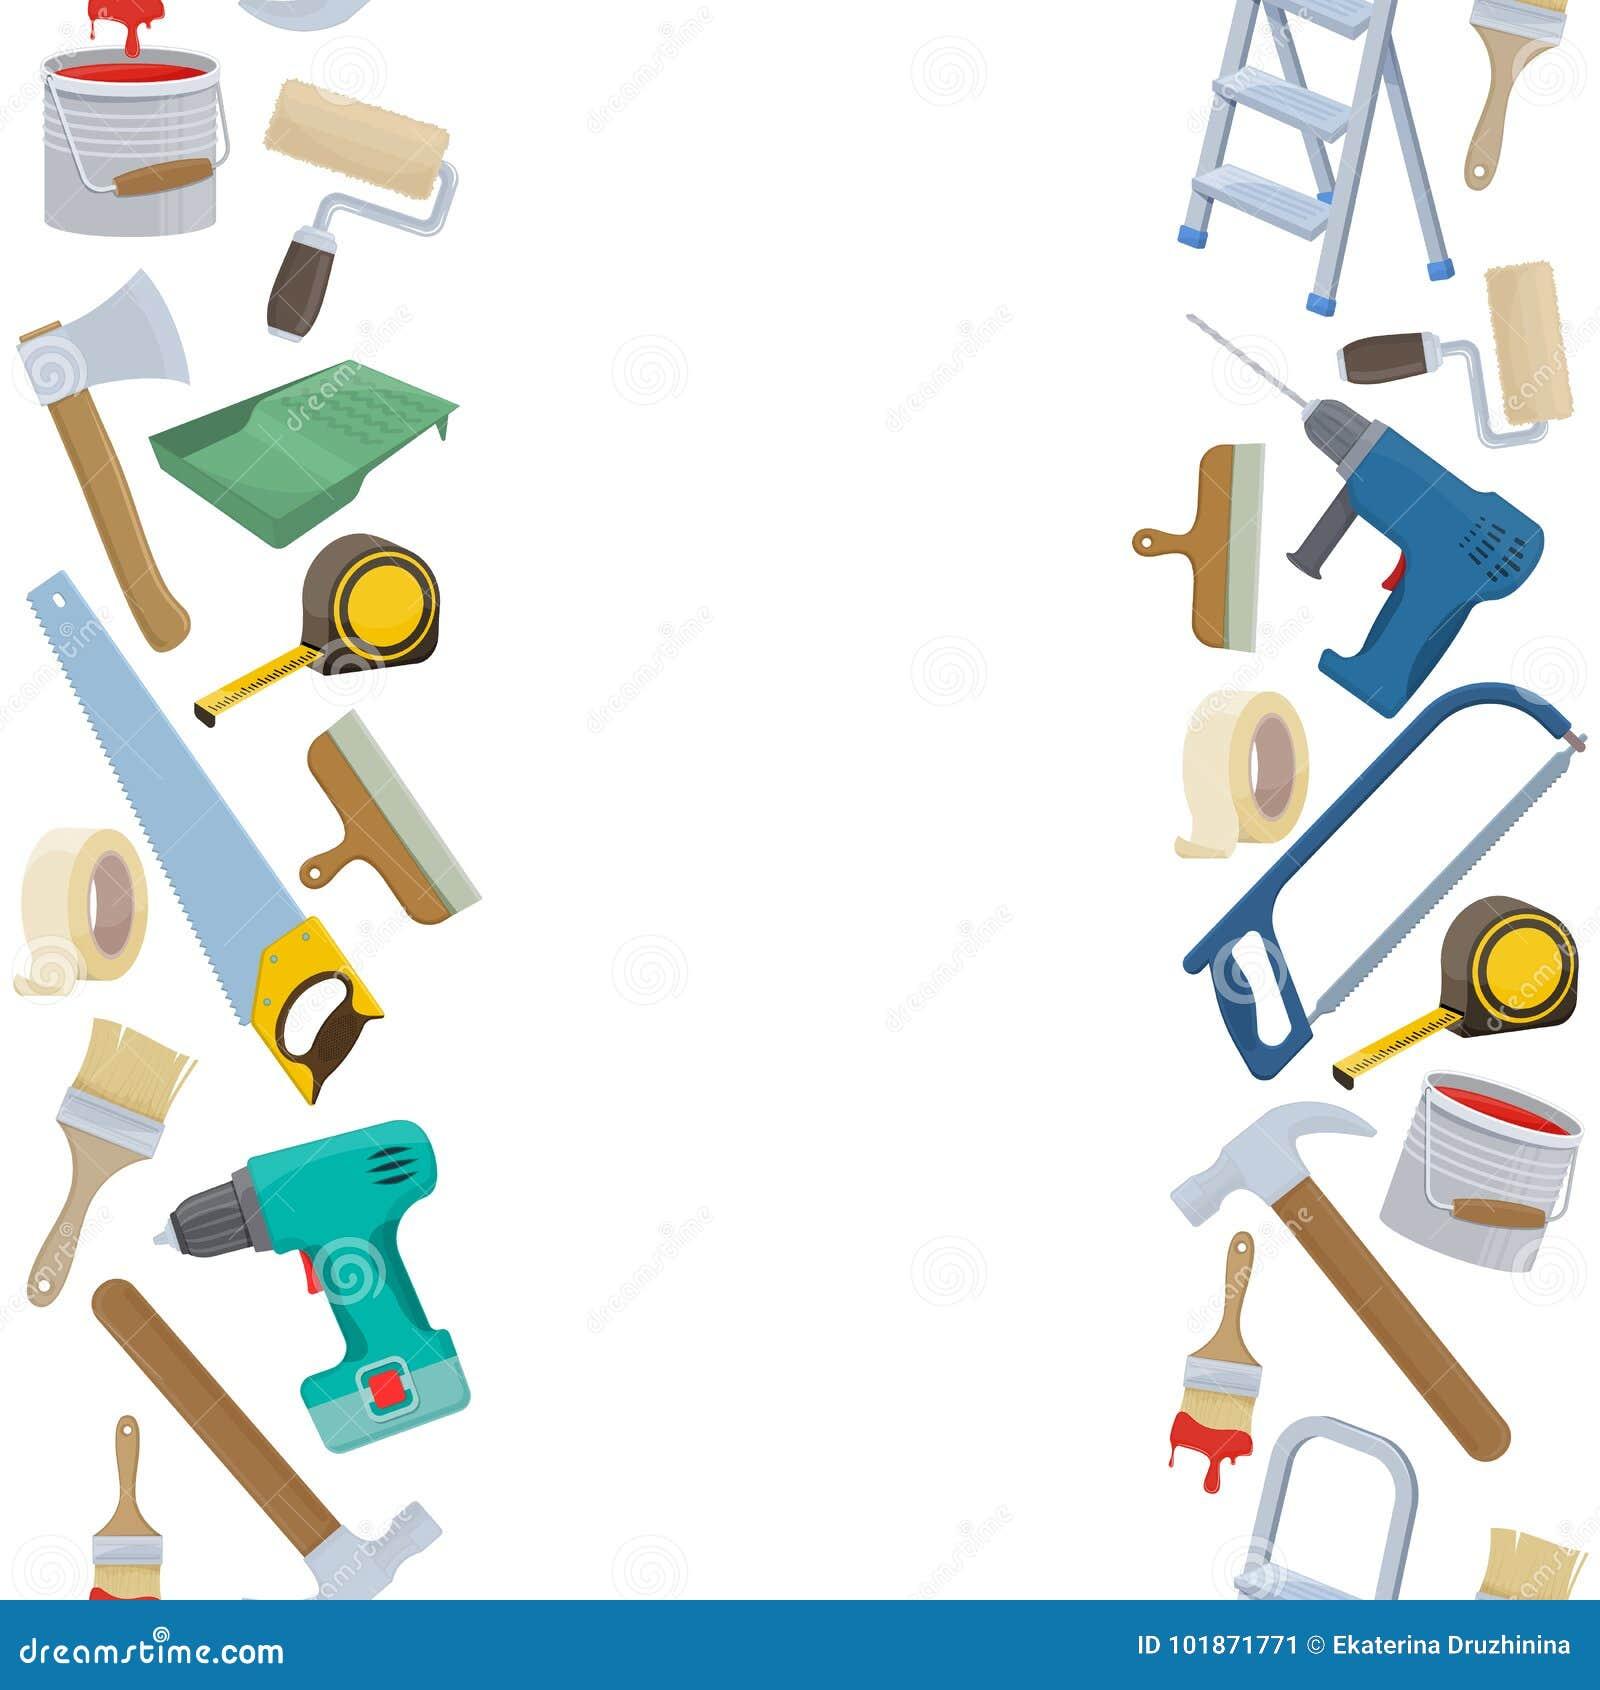 Repair tool illustration stock vector. Illustration of ...